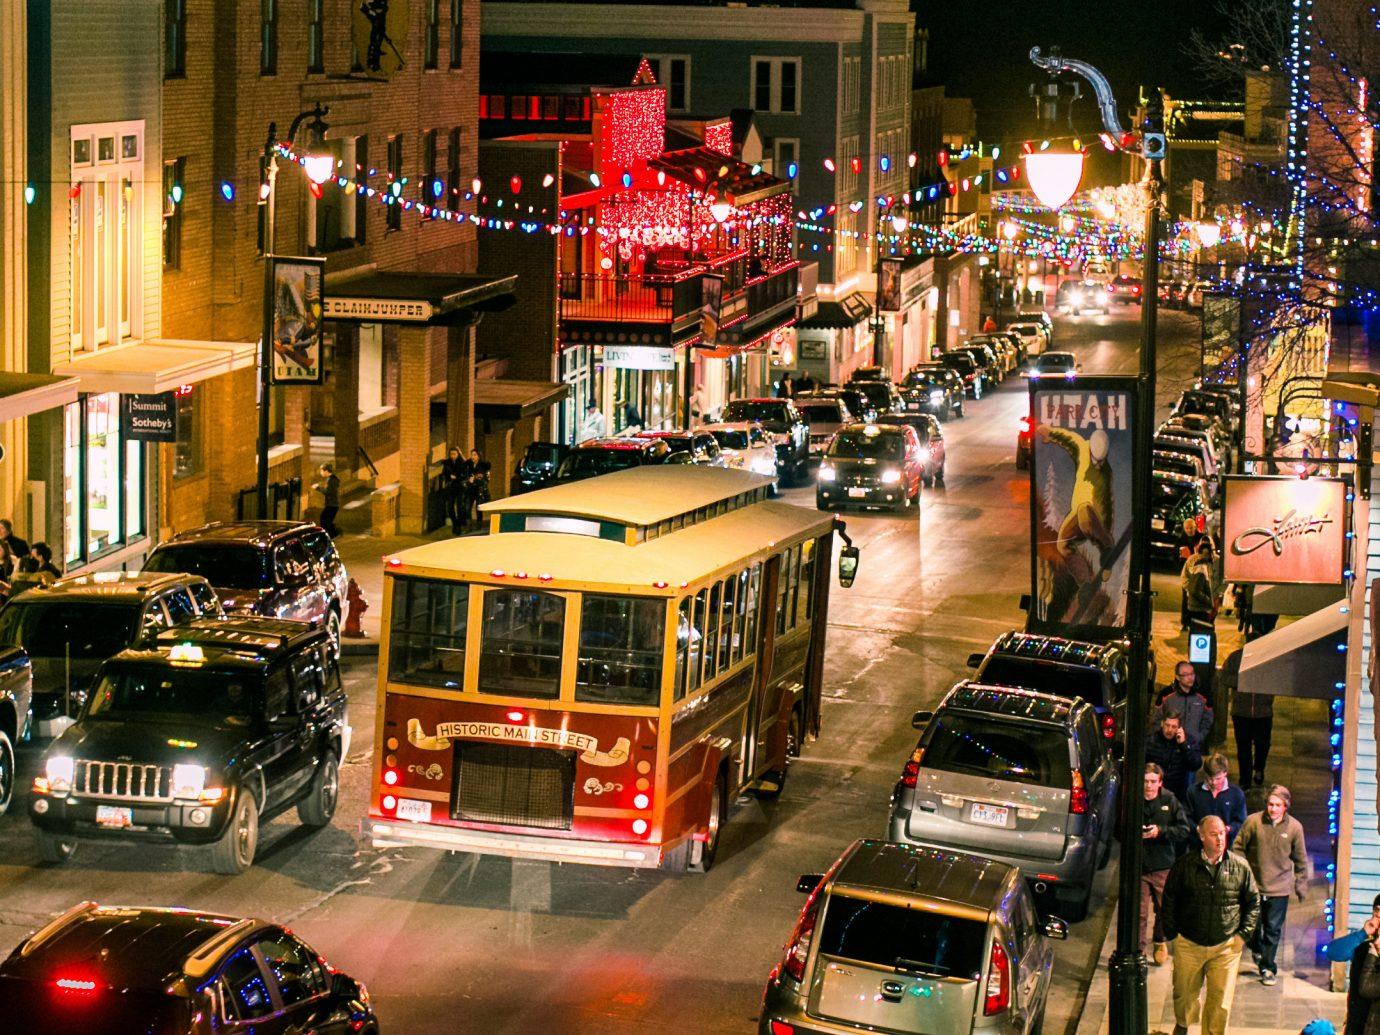 Mountains + Skiing Trip Ideas night City transport street traffic Downtown metropolis